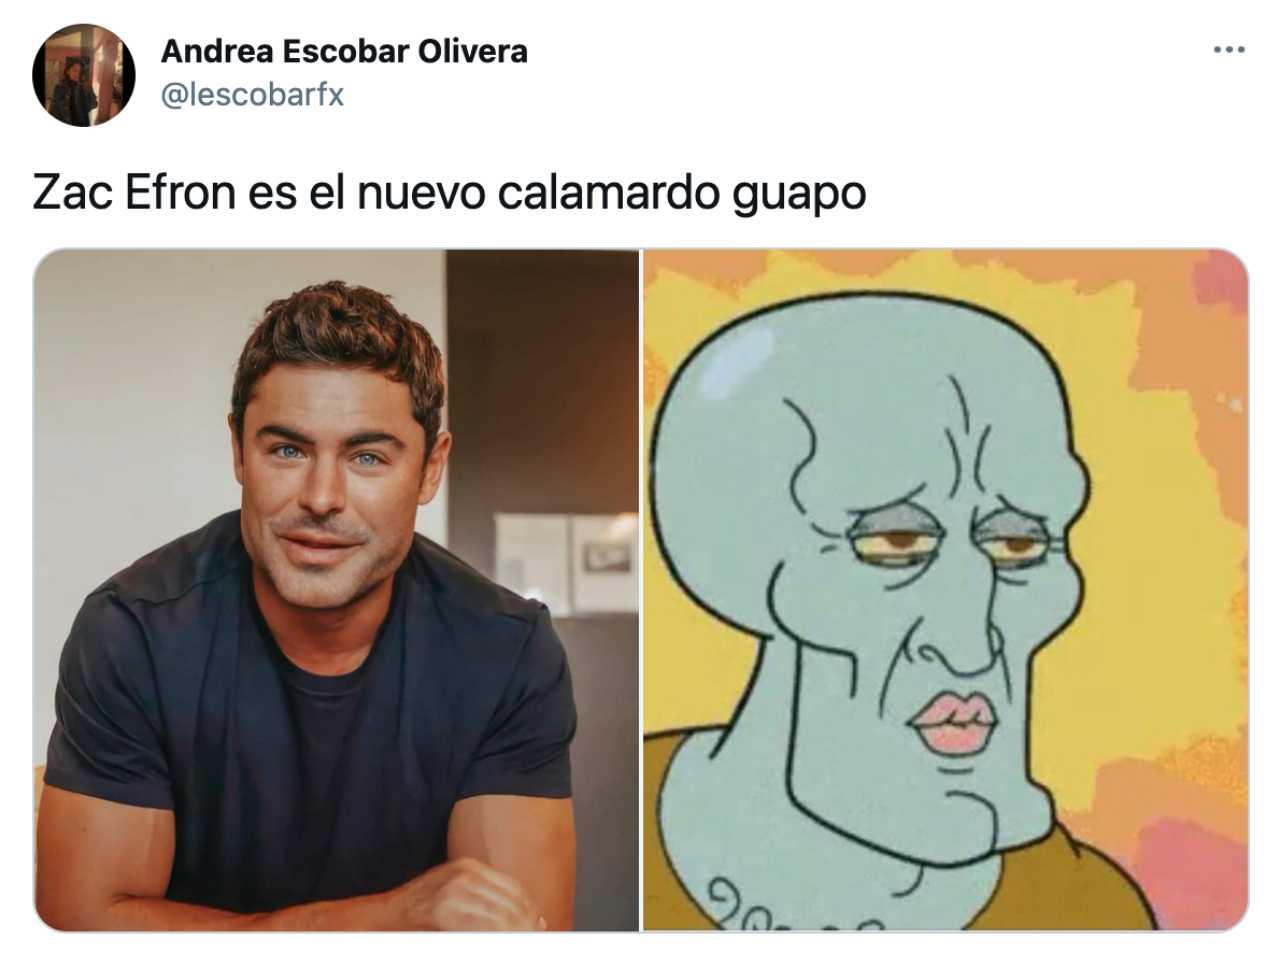 Meme de Zac Efron como Calamardo